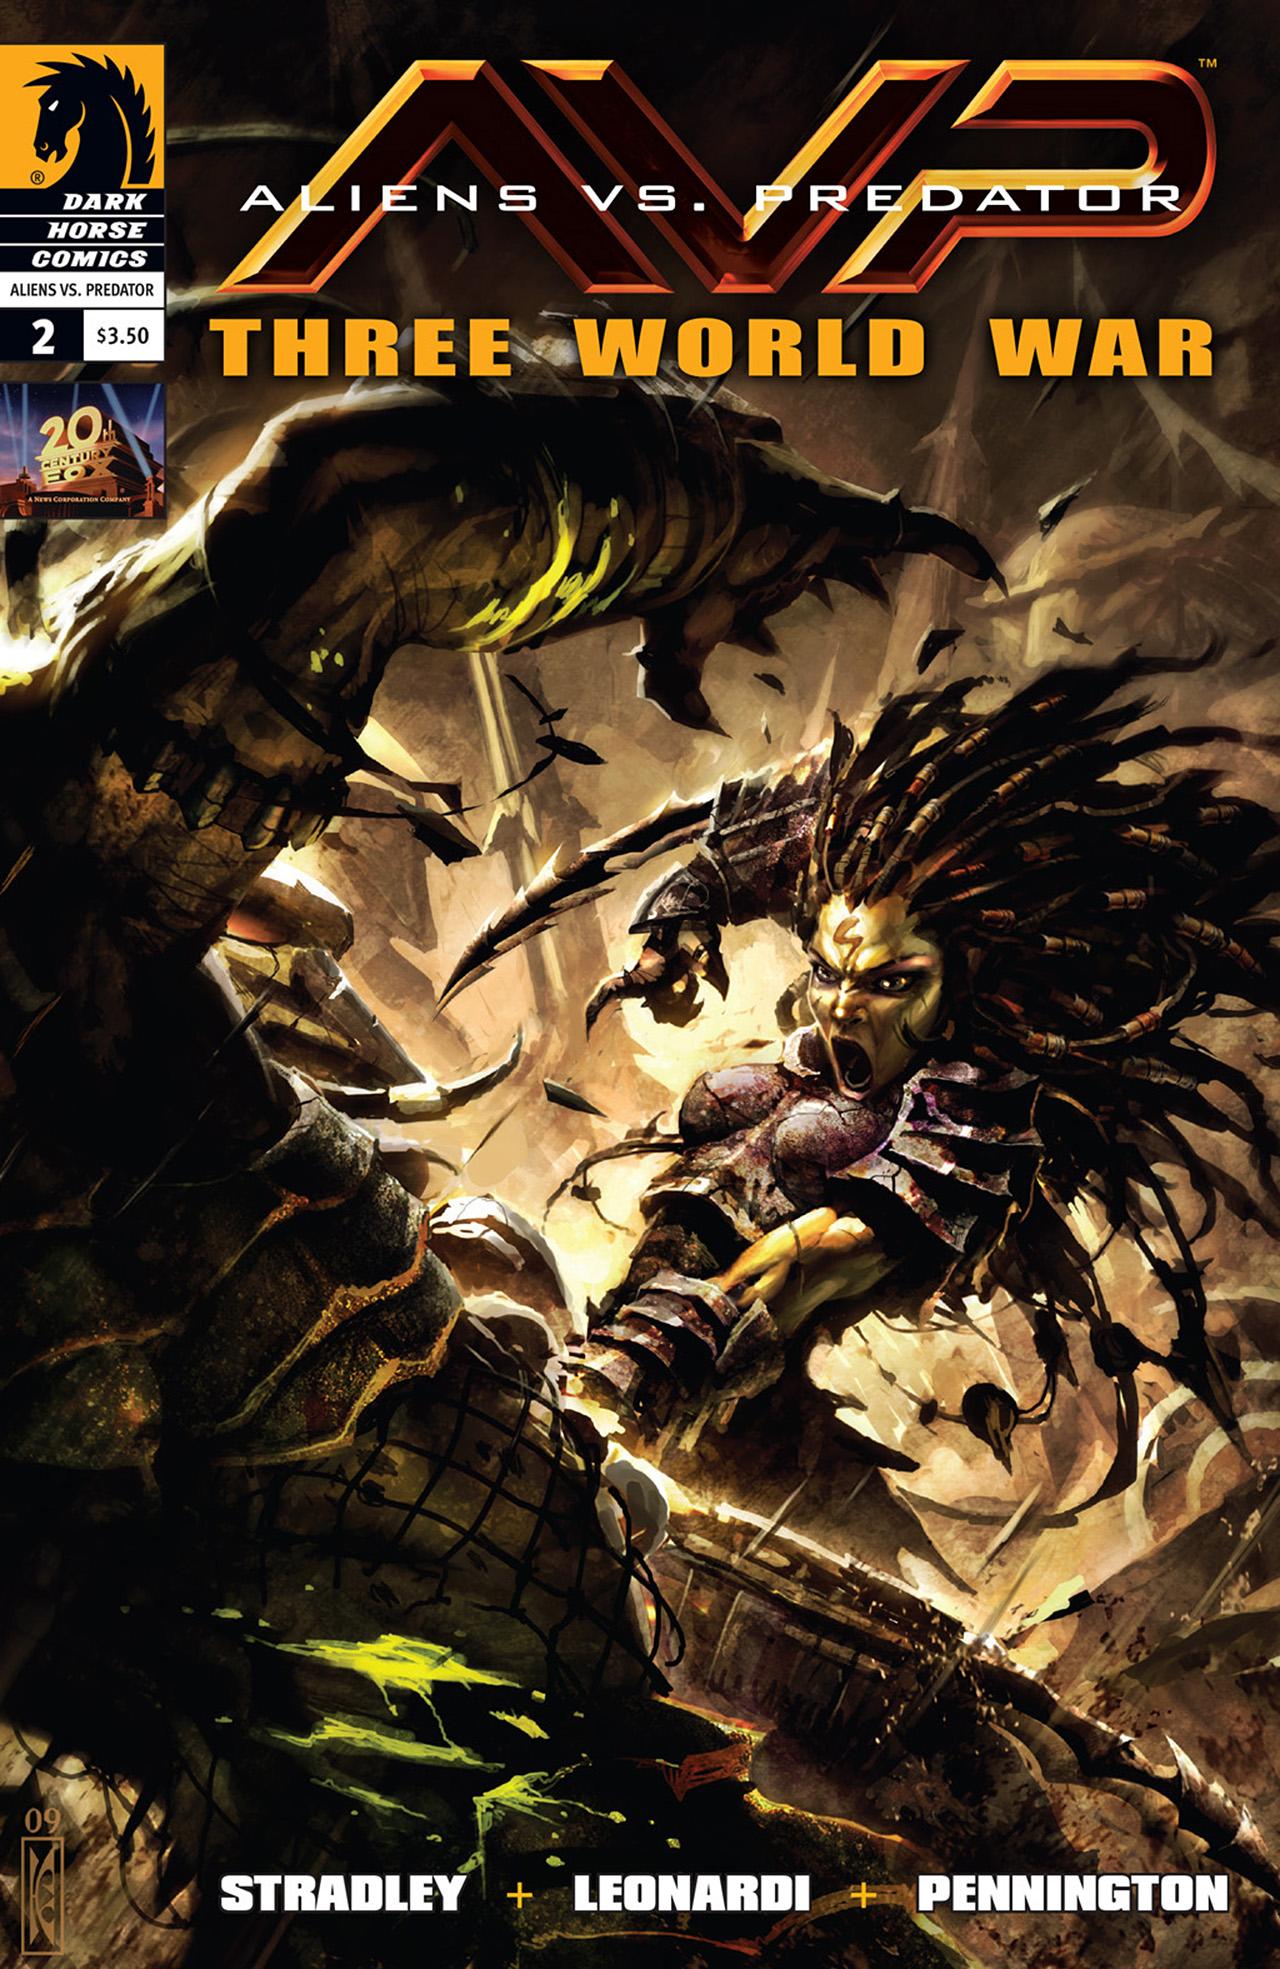 Aliens vs. Predator: Three World War 2 Page 1